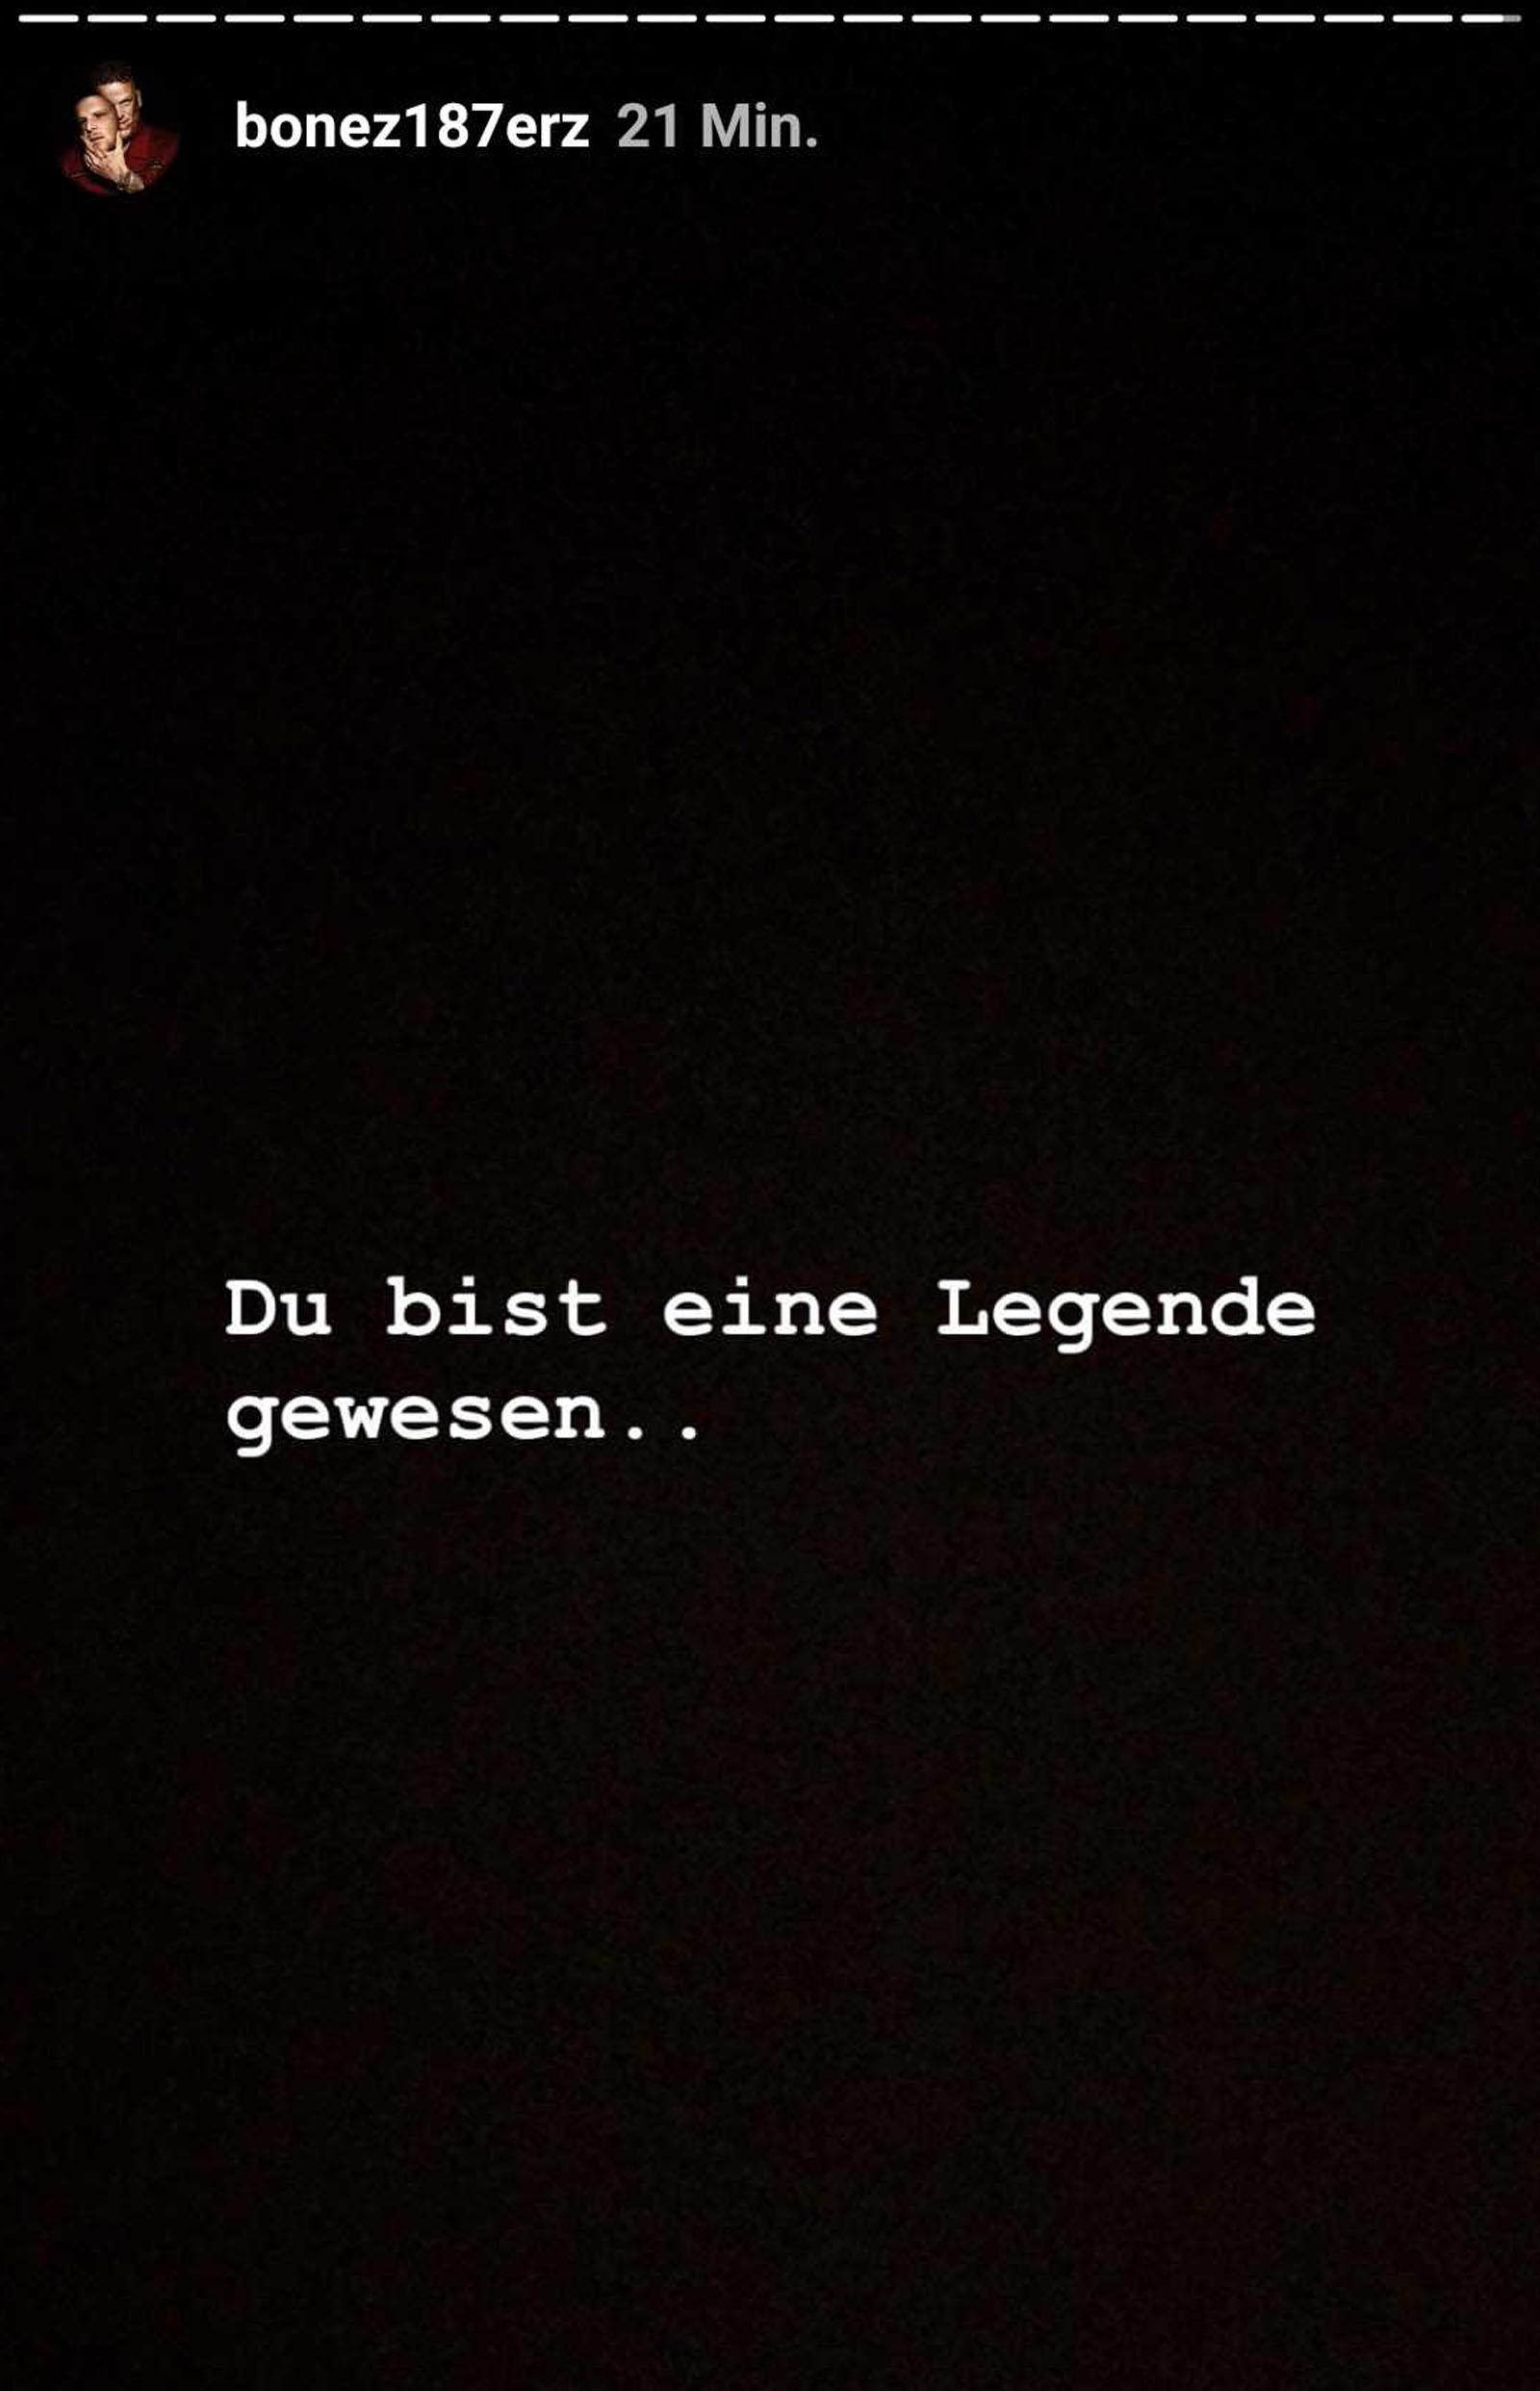 Bonez MC über Flers Legendenstatus